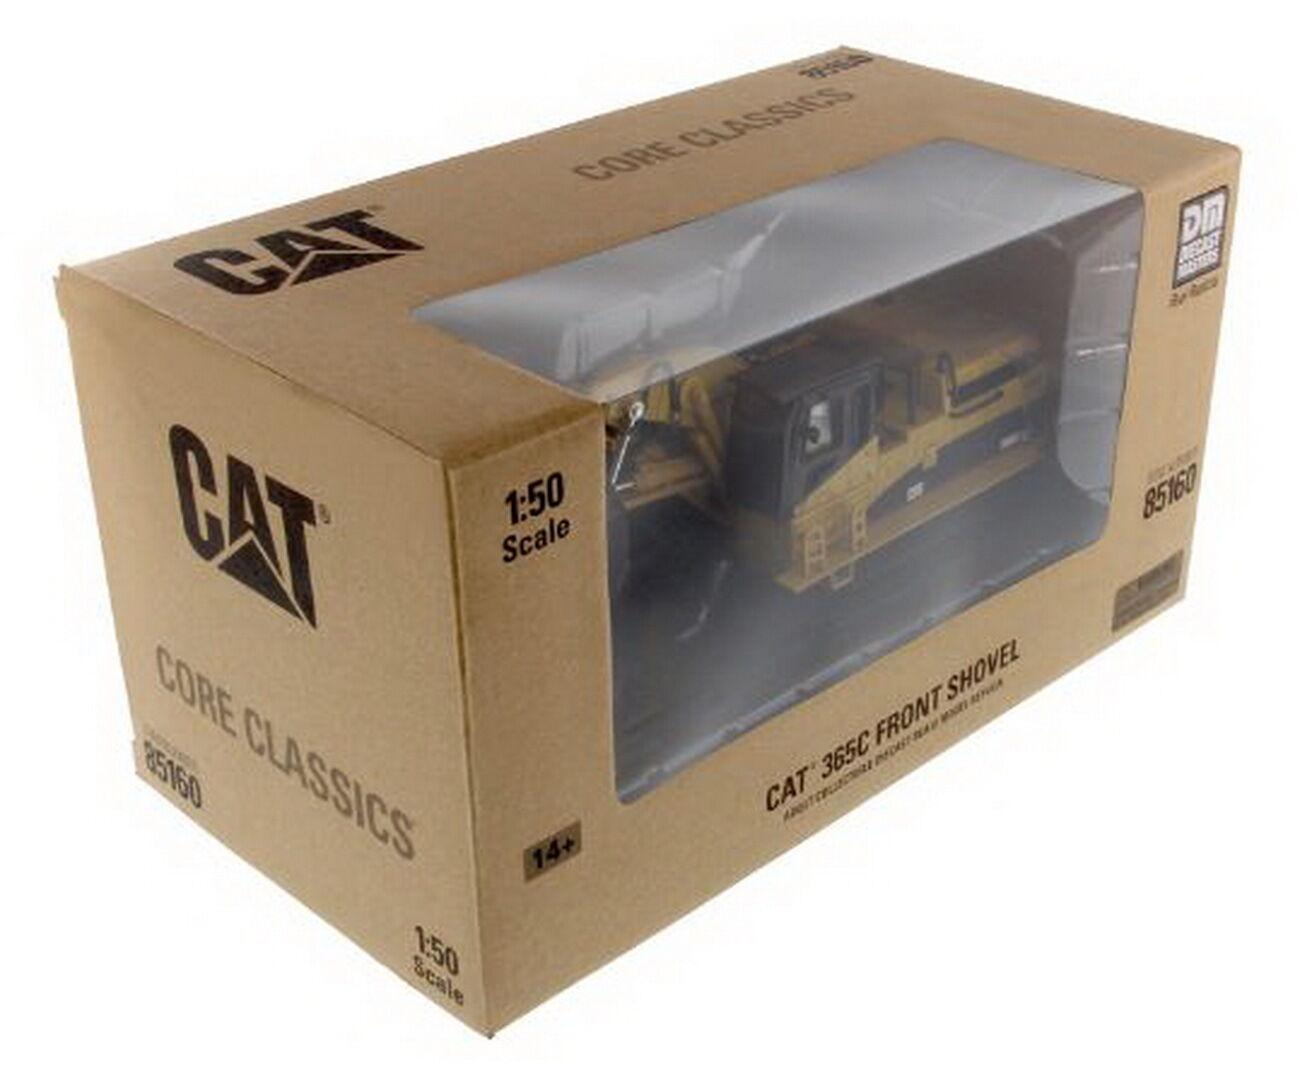 1 50 DM Caterpillar Cat 365C Front Shovel Shovel Shovel Diecast Model 56c23a